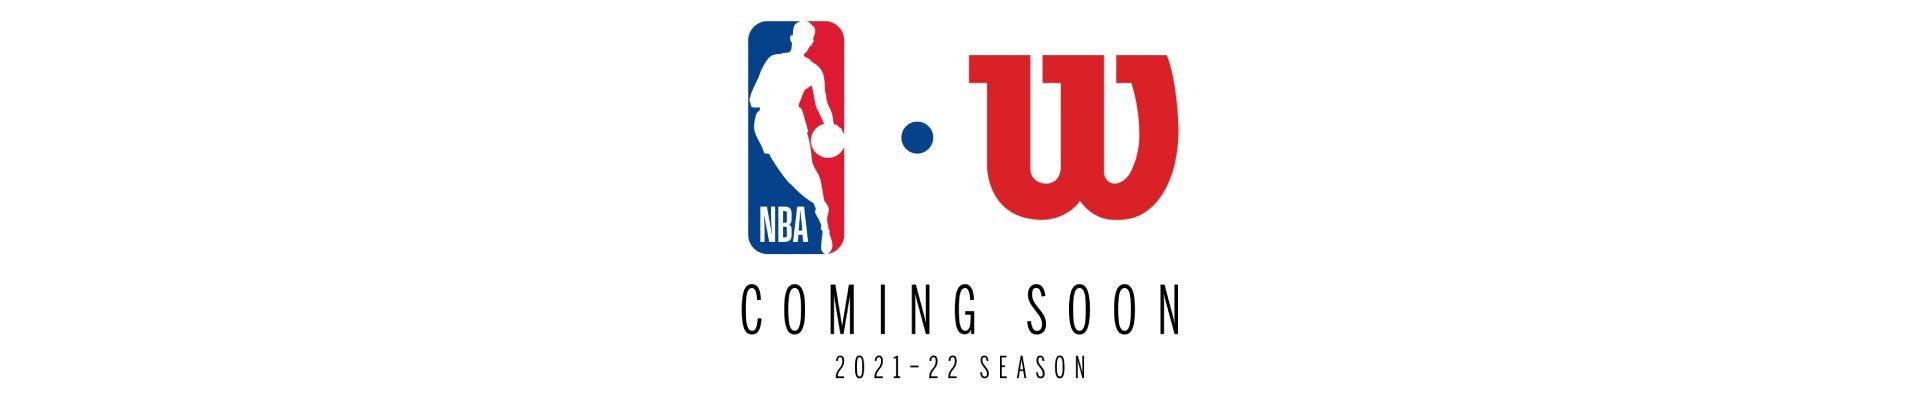 Wilson Partners with the NBA - Coming soon 21/22 season